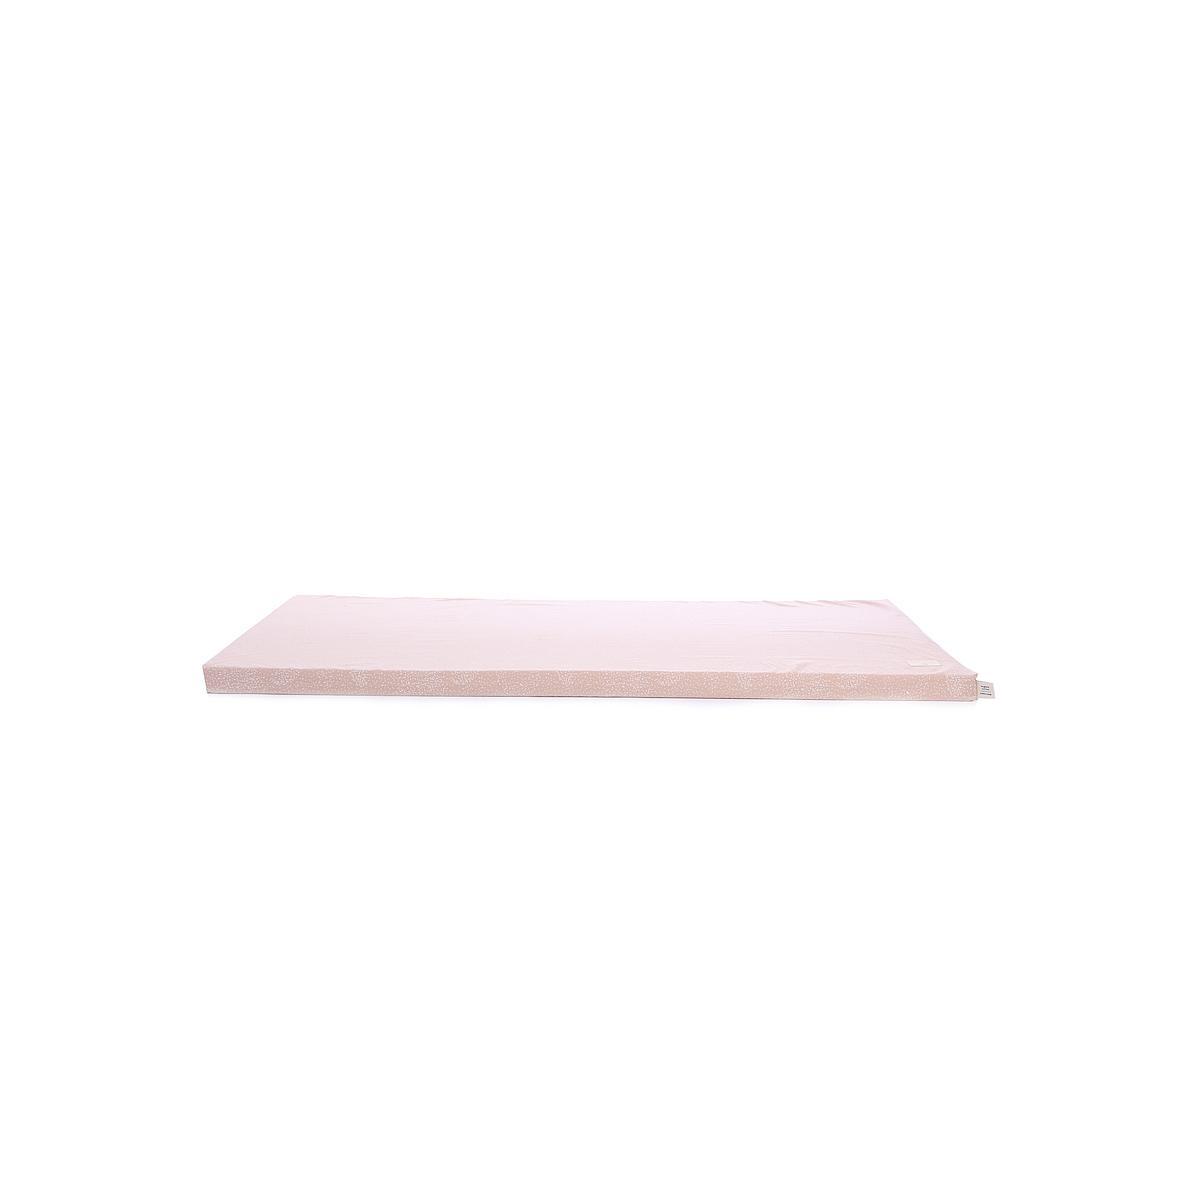 Colchón 60x120cm ST BARTH ELEMENTS Nobodinoz white bubble-misty pink